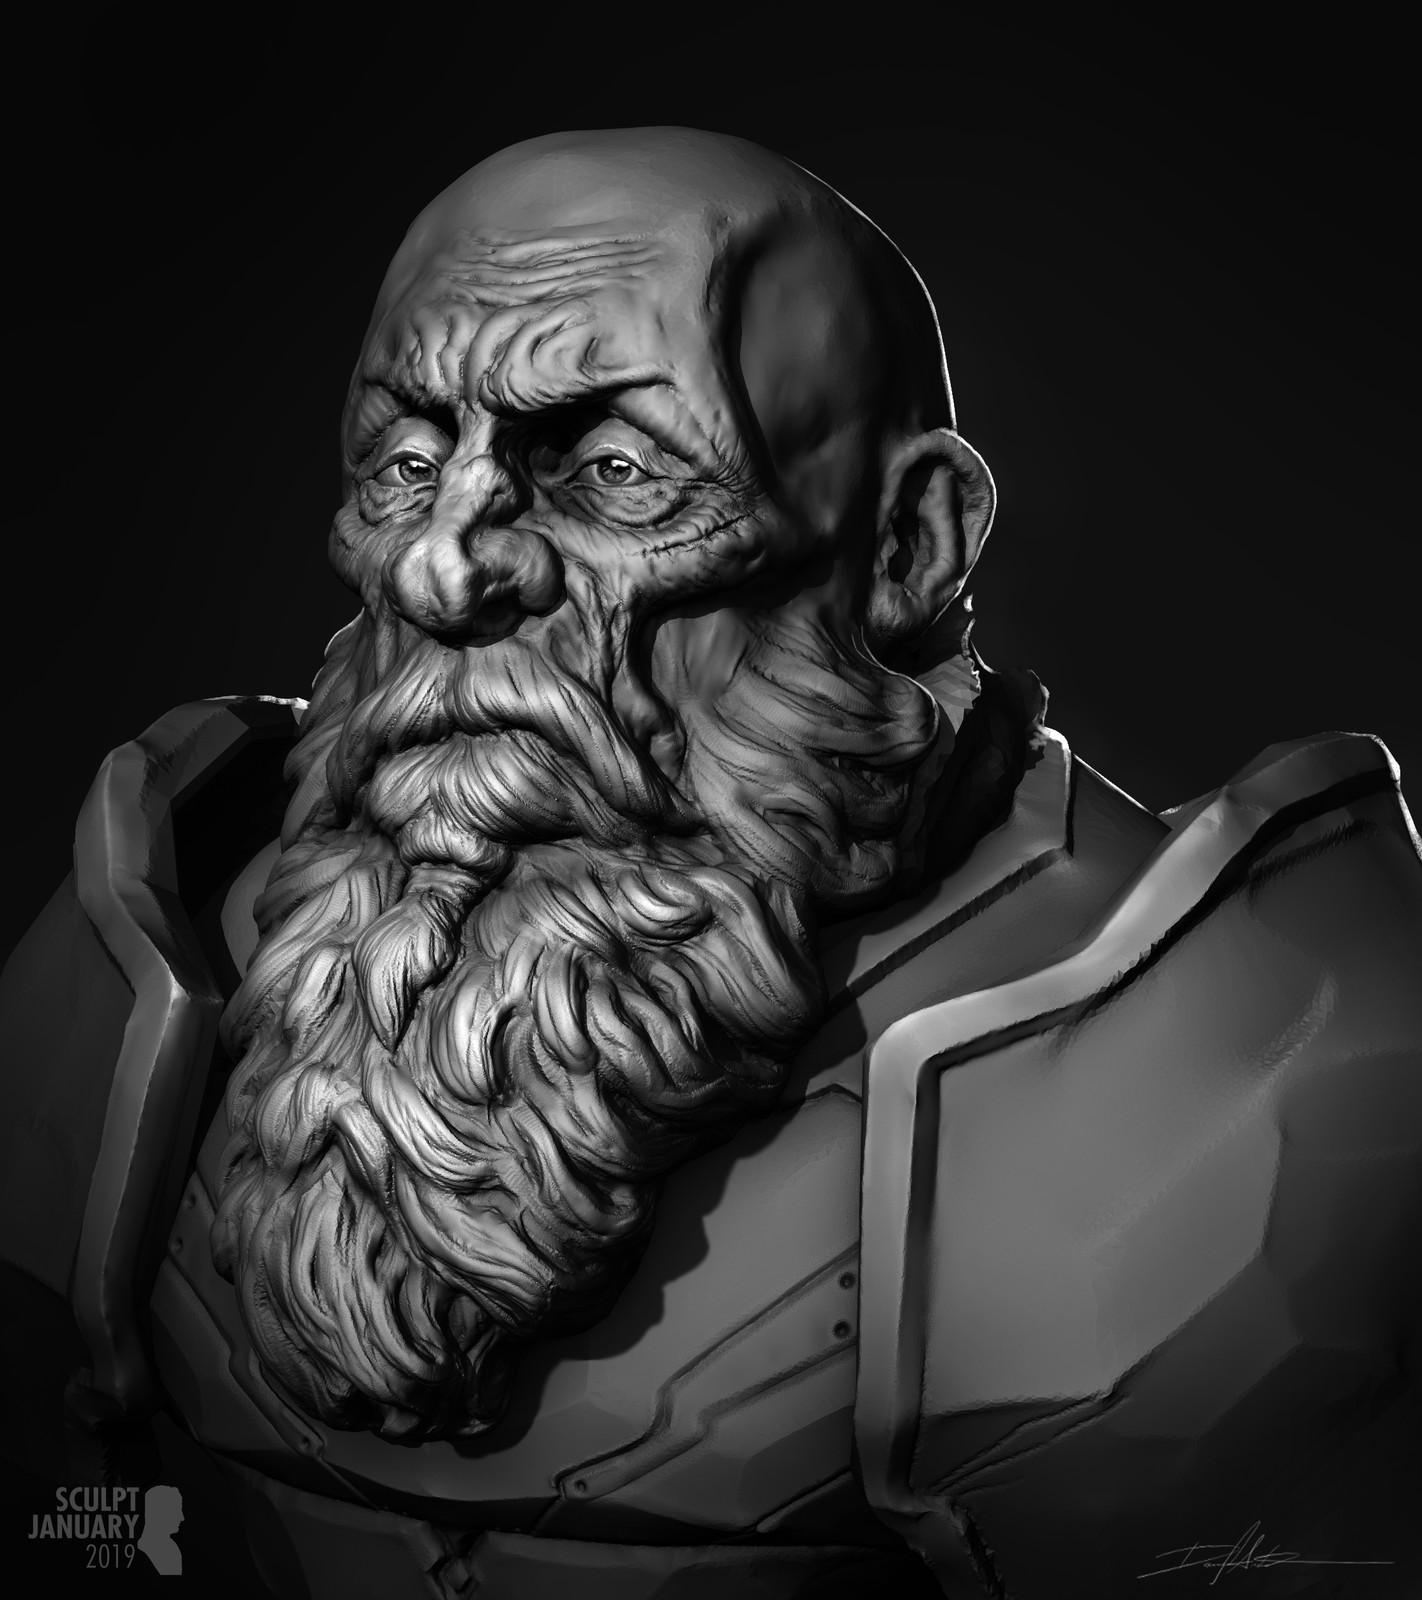 SCULPT JANUARY Day 10 - Beard